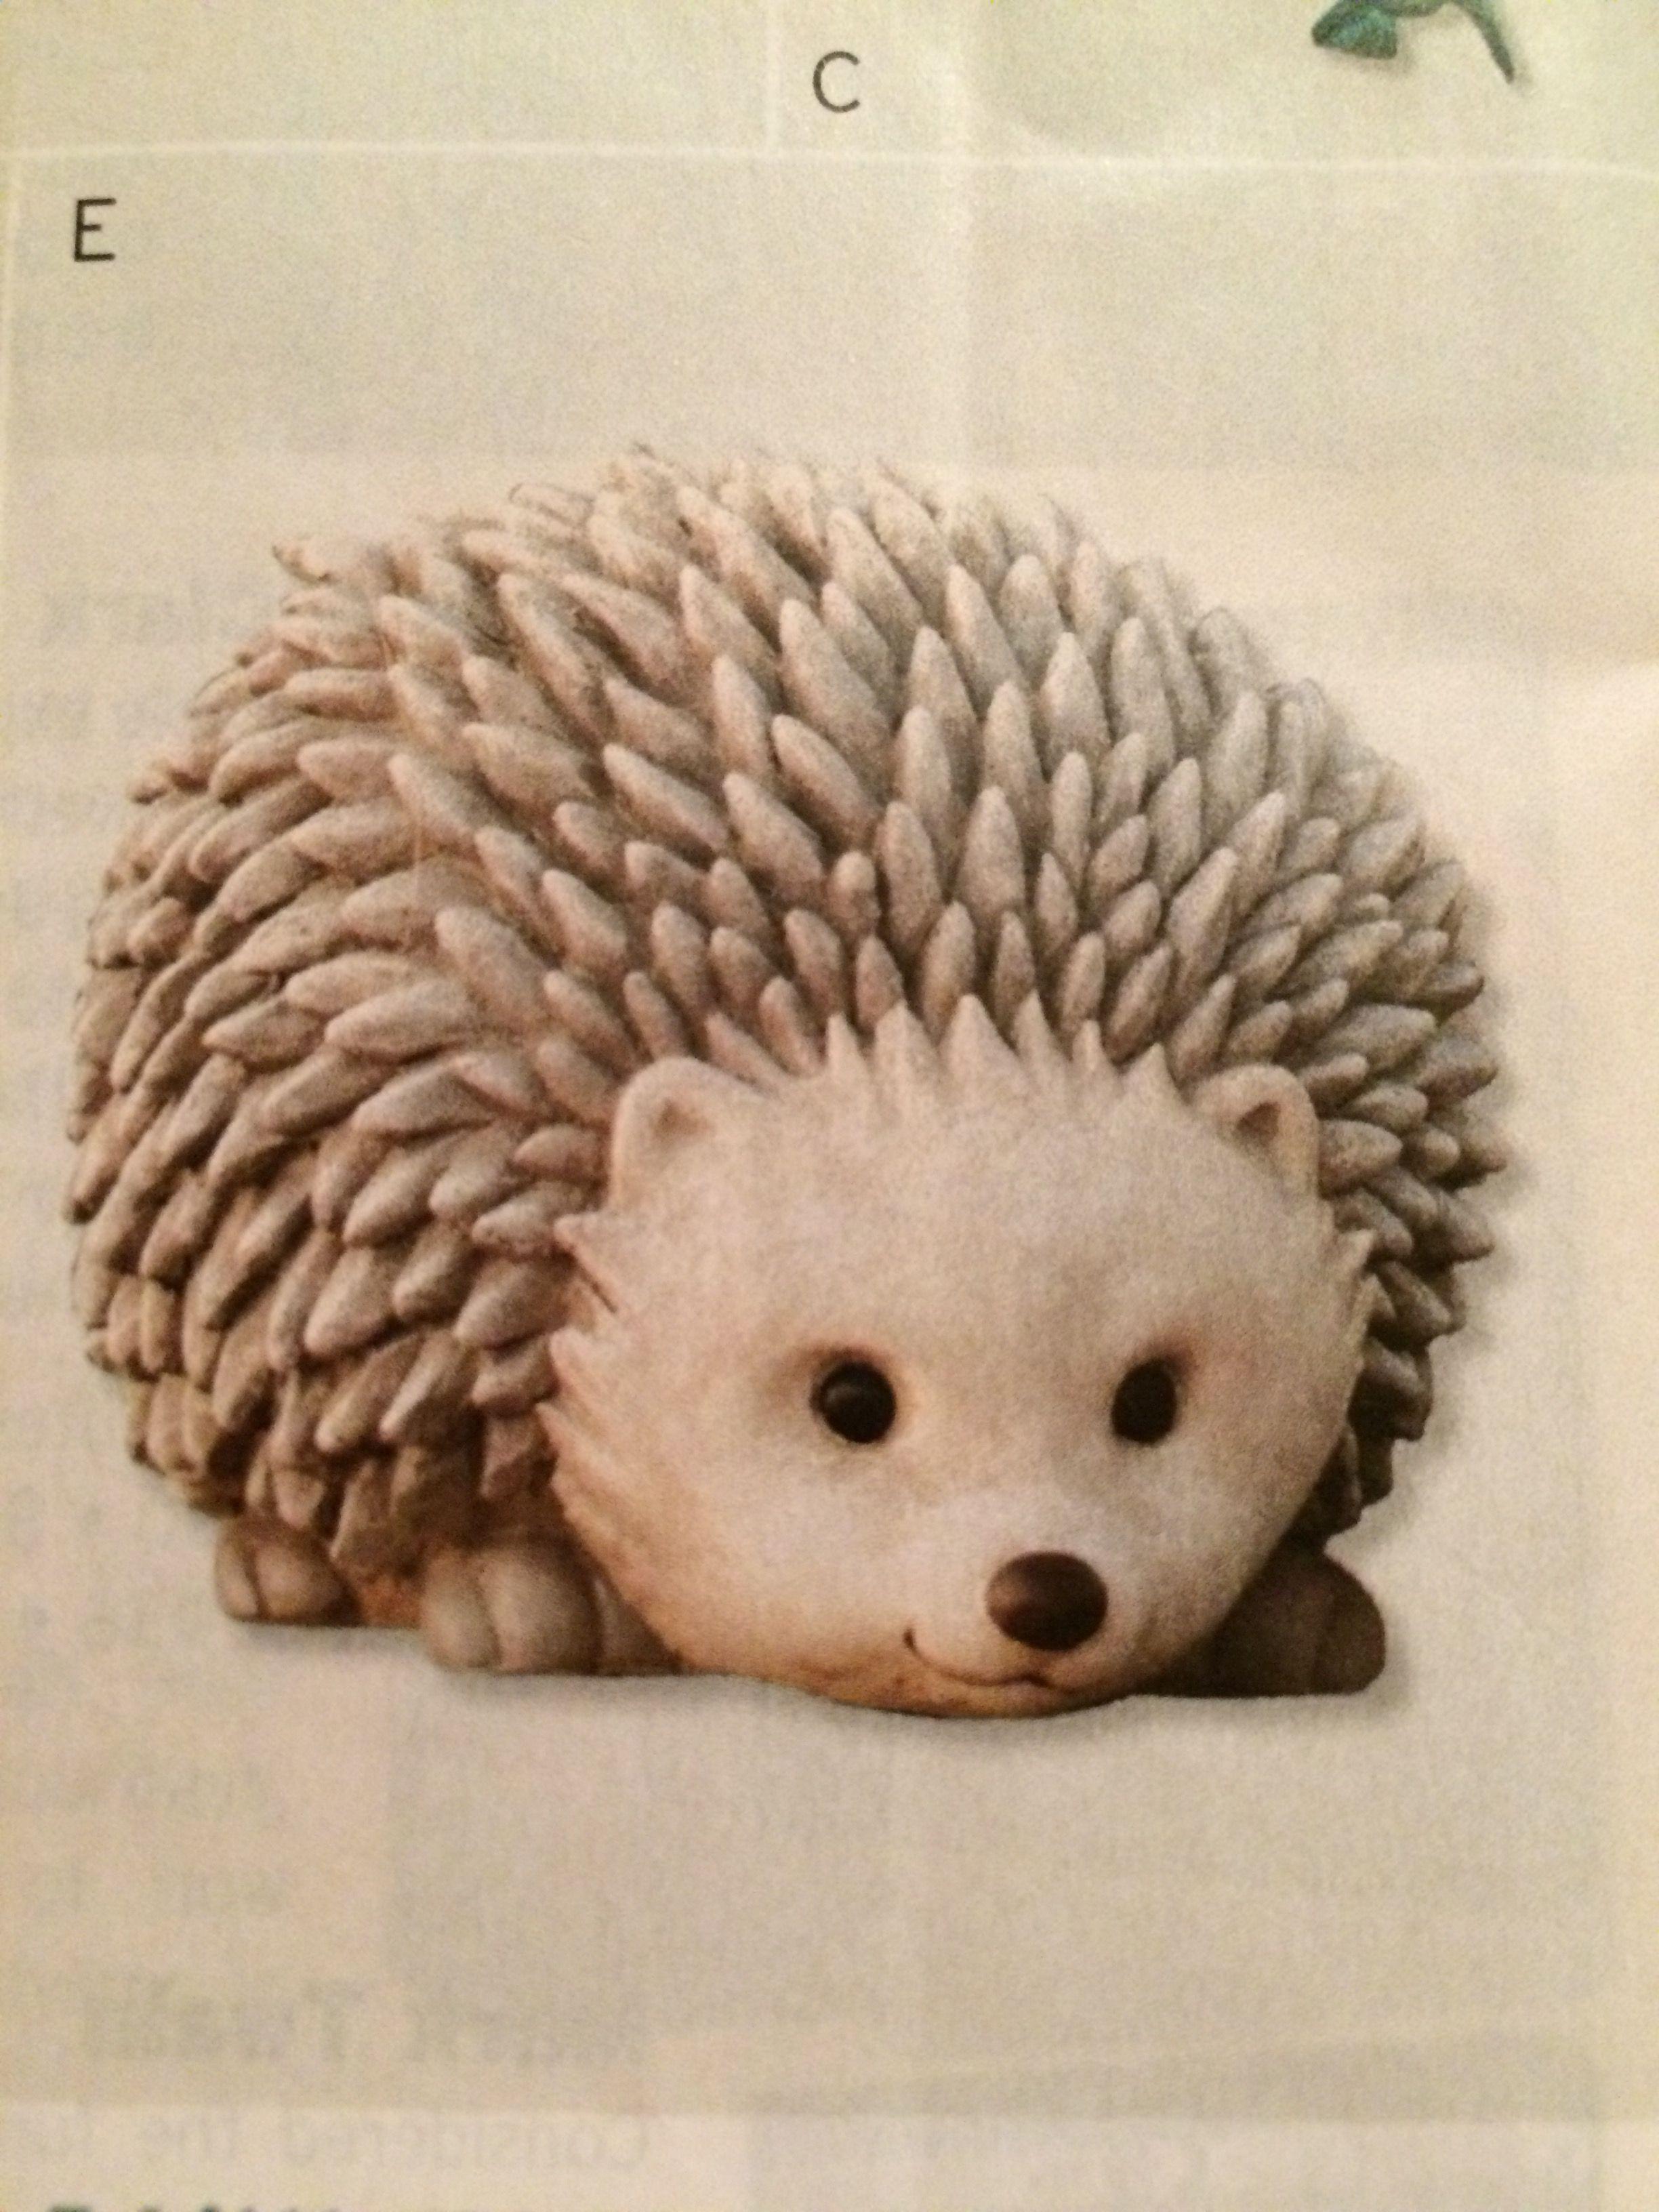 PBS catalog Hedgehog garden sculpture -$24.99 and pricelessly cute!